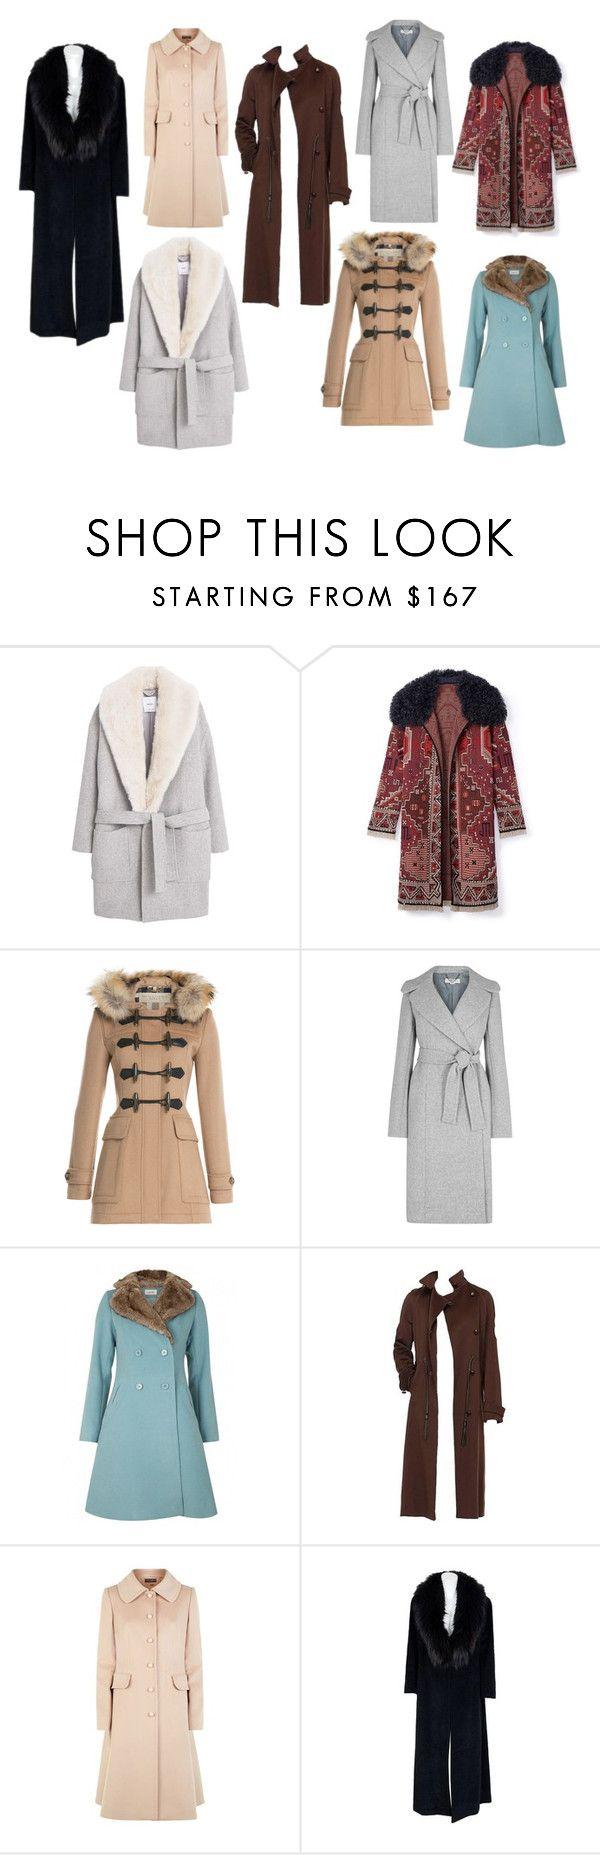 """пальто 15-16"" by tatyana-yurasova on Polyvore featuring мода, MANGO, Tory Burch, Burberry, STELLA McCARTNEY, Louche, Yves Saint Laurent, Dolce&Gabbana и Sorelle Fontana"